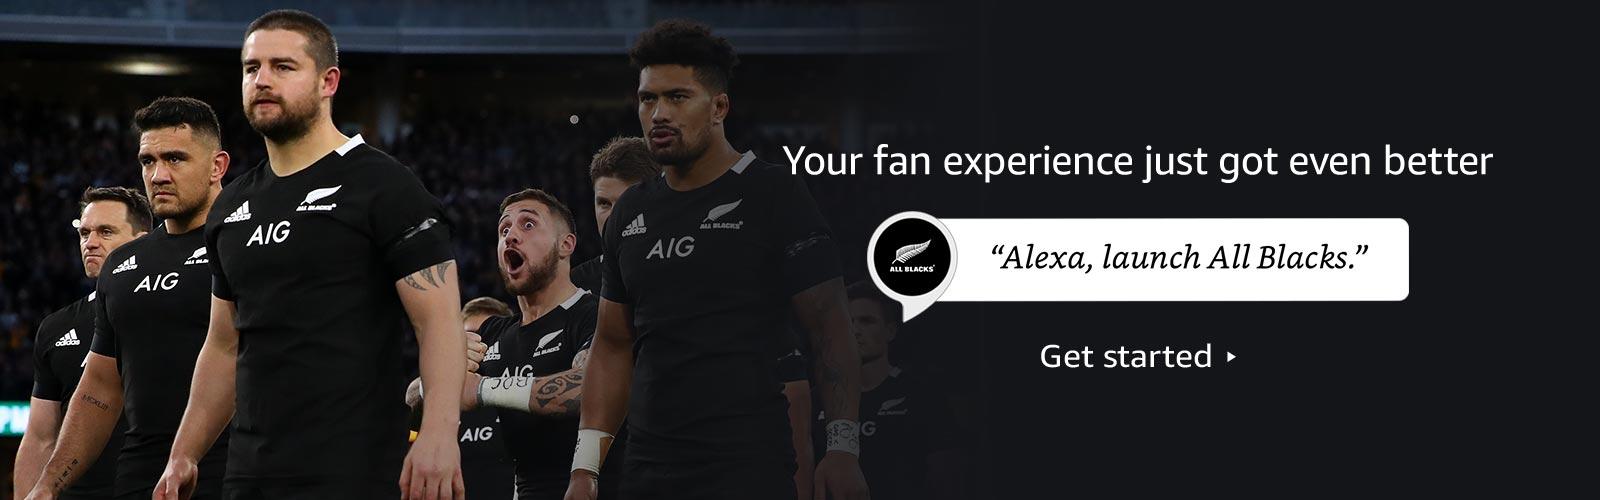 Alexa, launch All Blacks